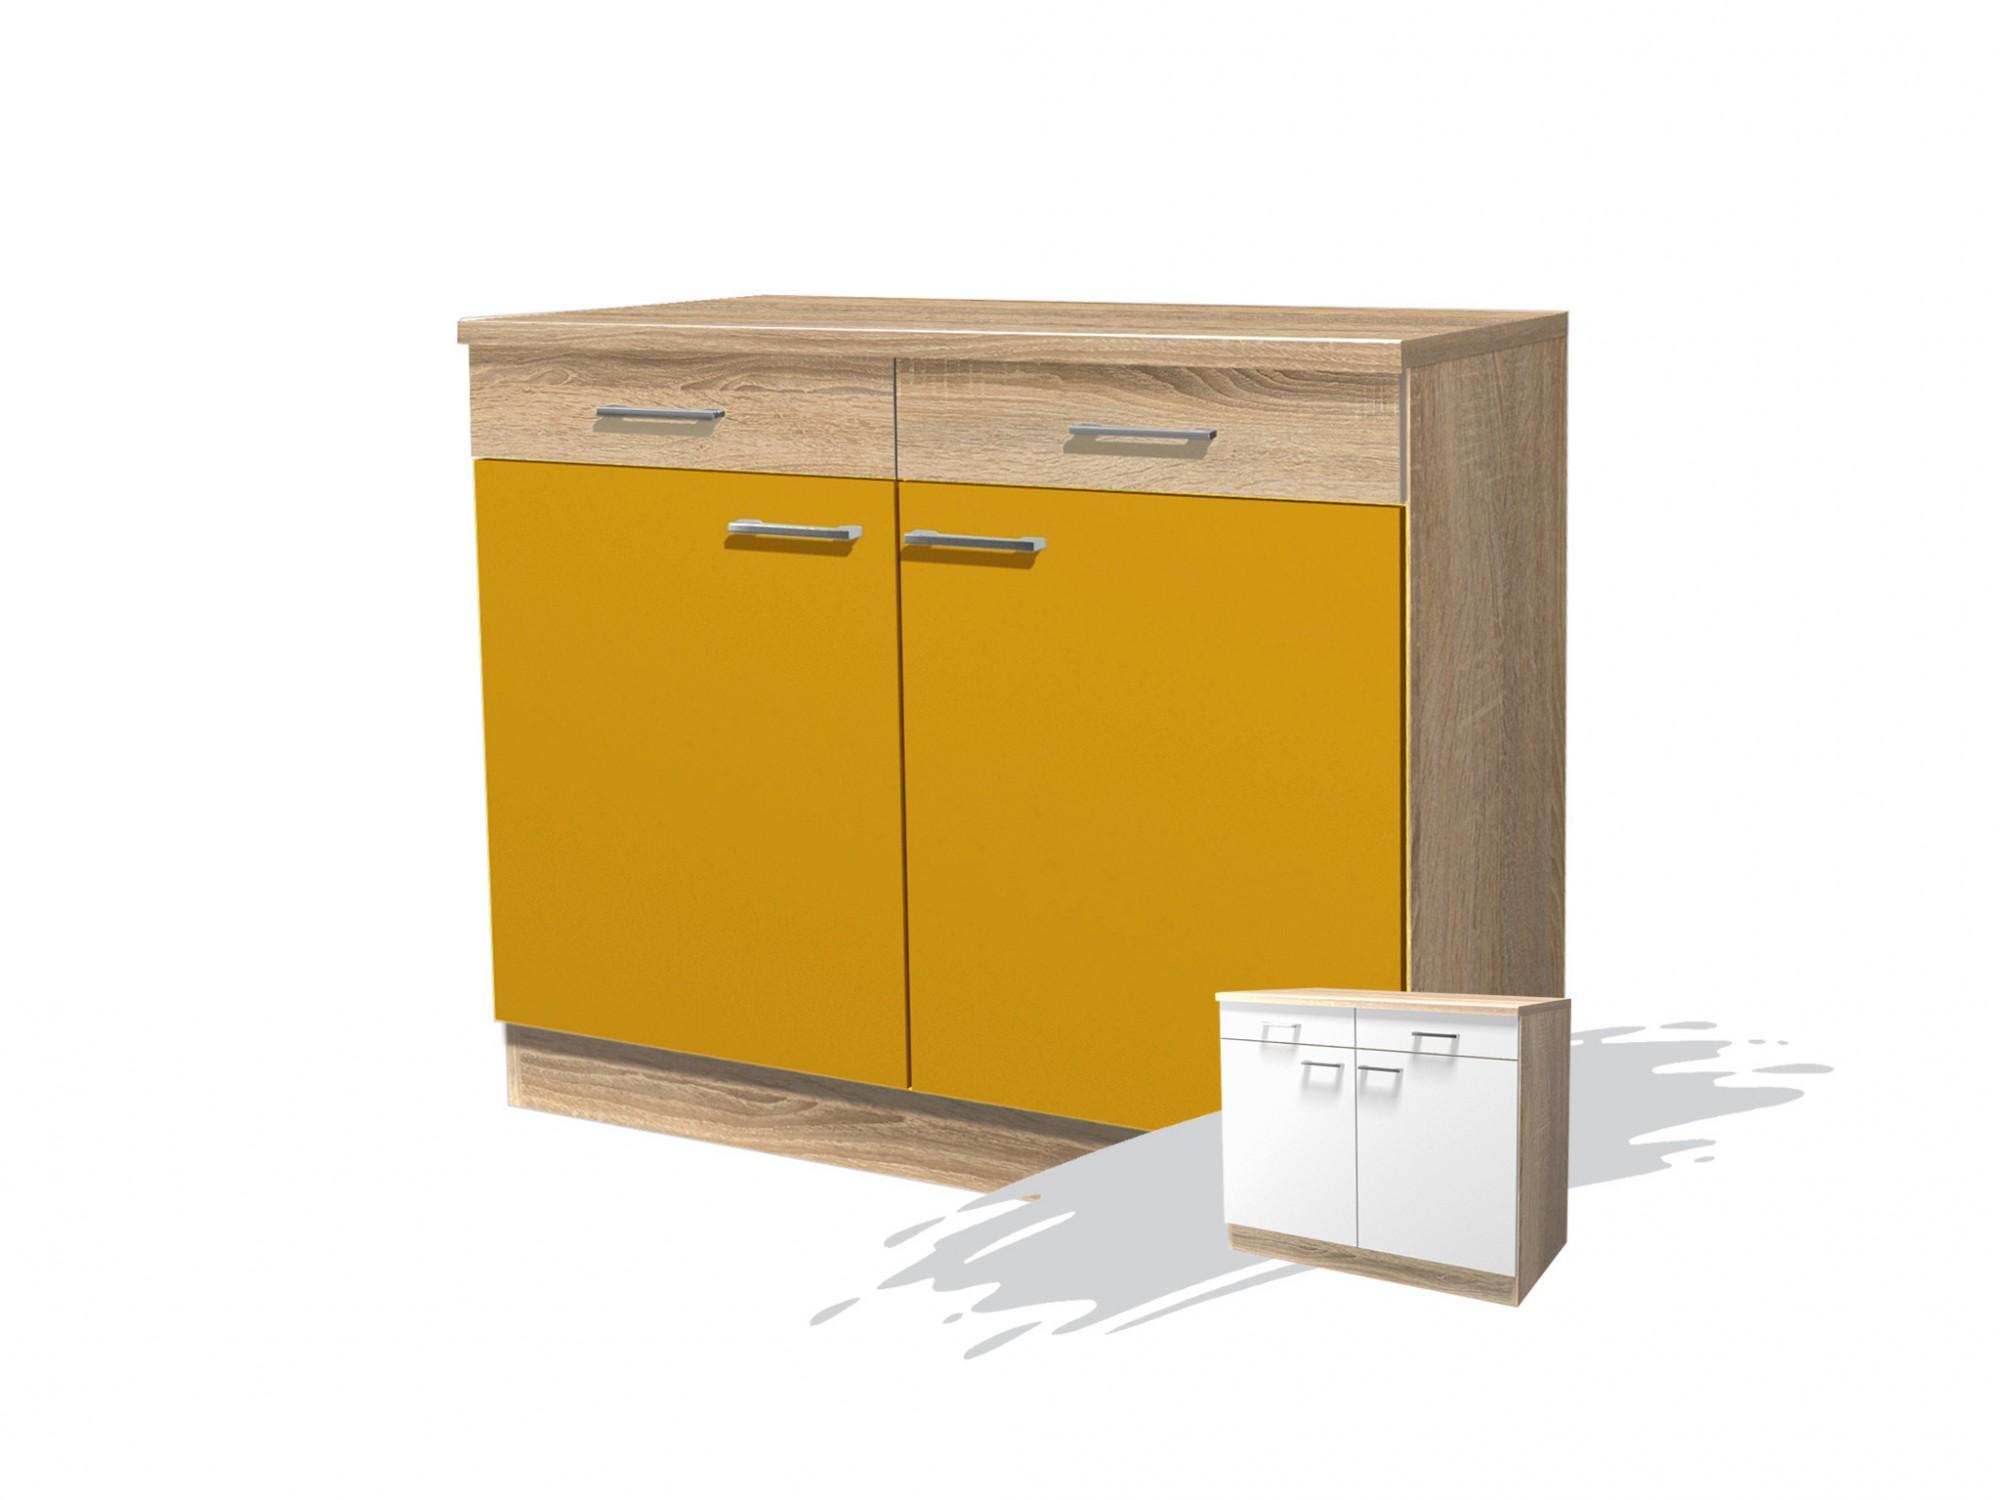 emejing k chen unterschrank 100 cm gallery house design ideas. Black Bedroom Furniture Sets. Home Design Ideas